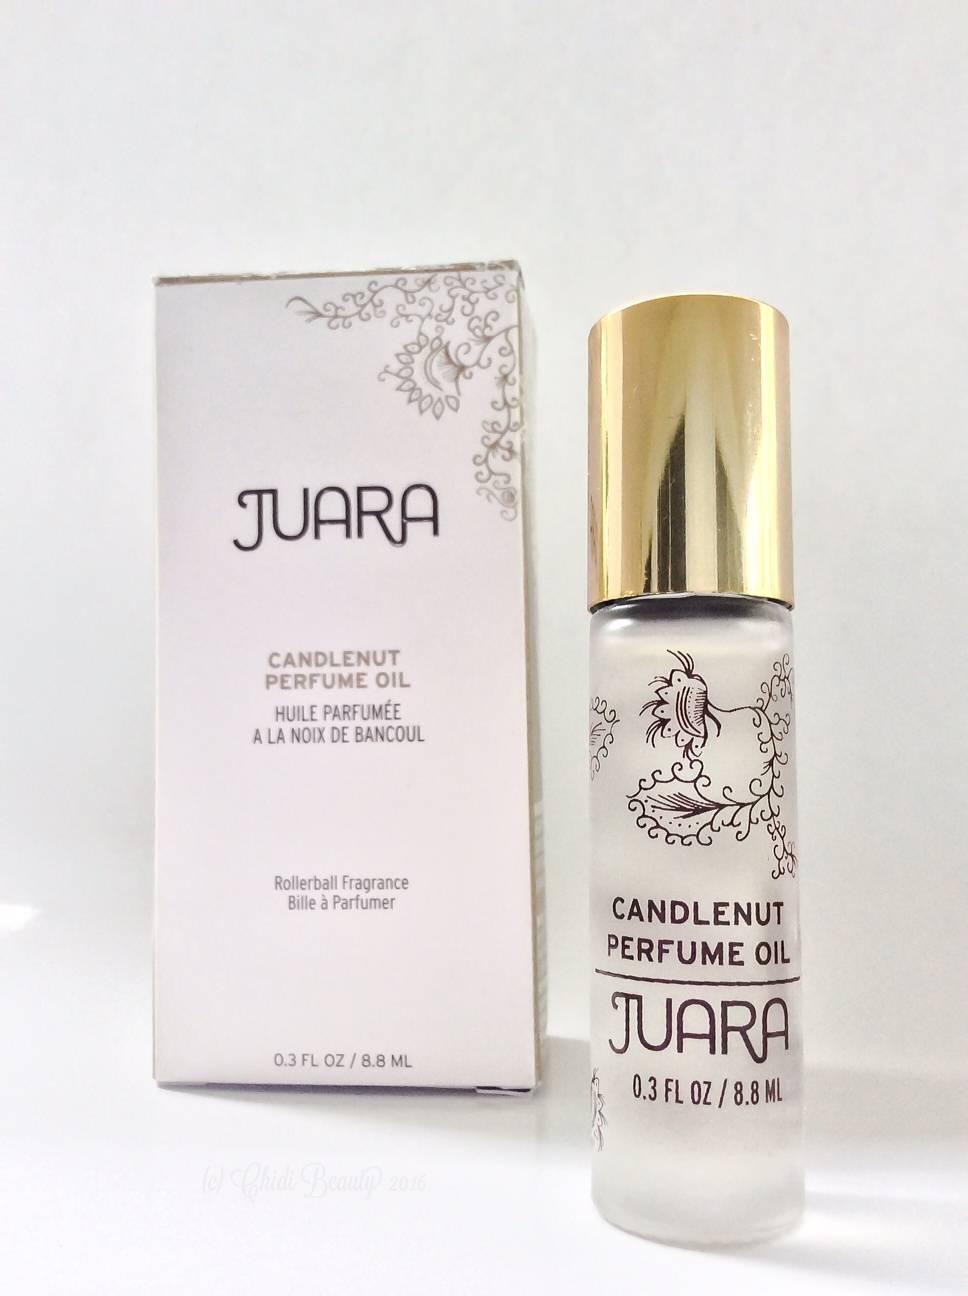 Juara Candlenut Perfume Oil with Box • chidibeauty.com